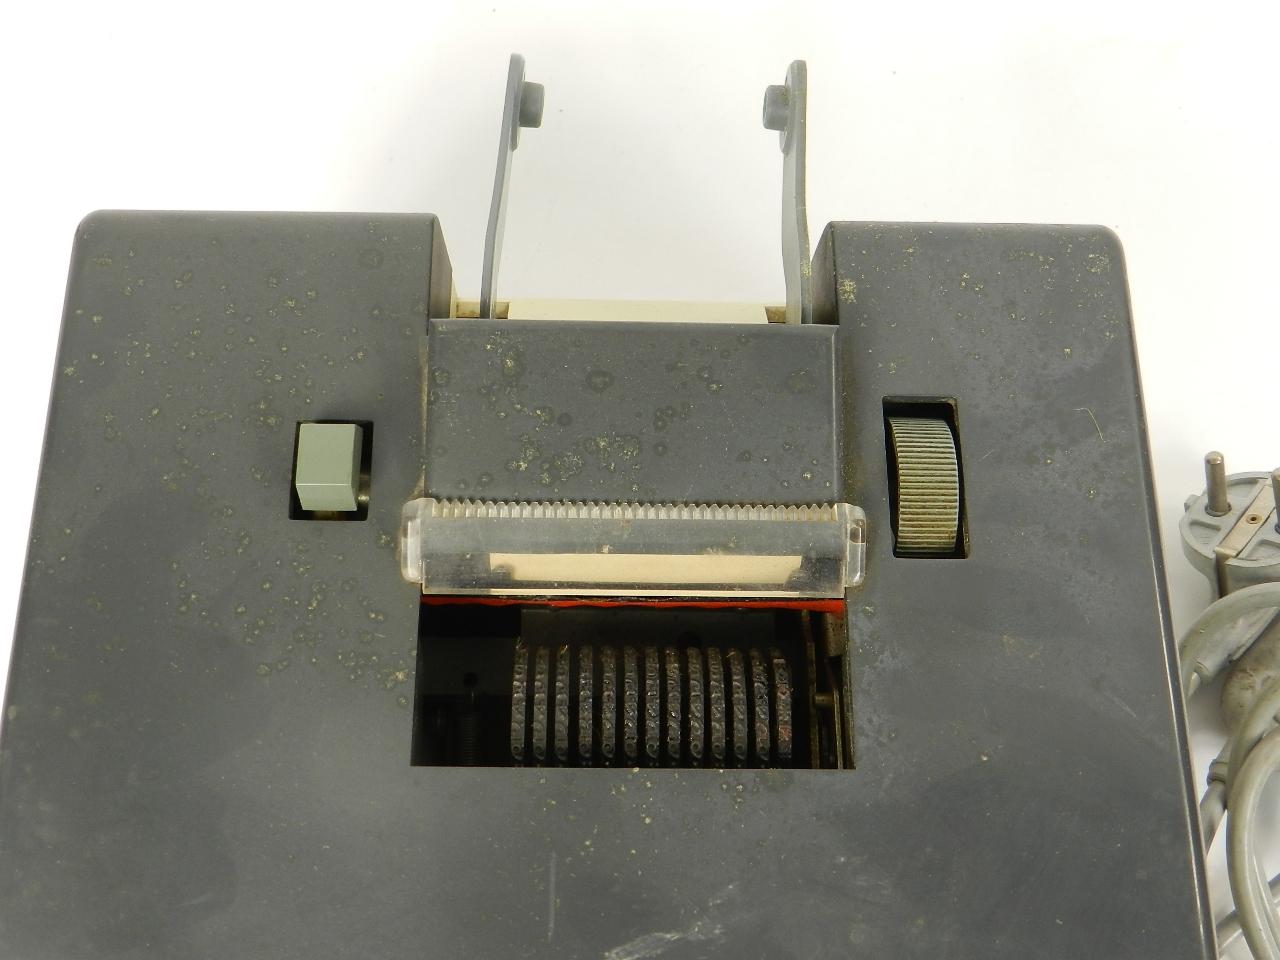 Imagen WALTHER Mod. MULTA 33 ELECTRICA 220 V 33644